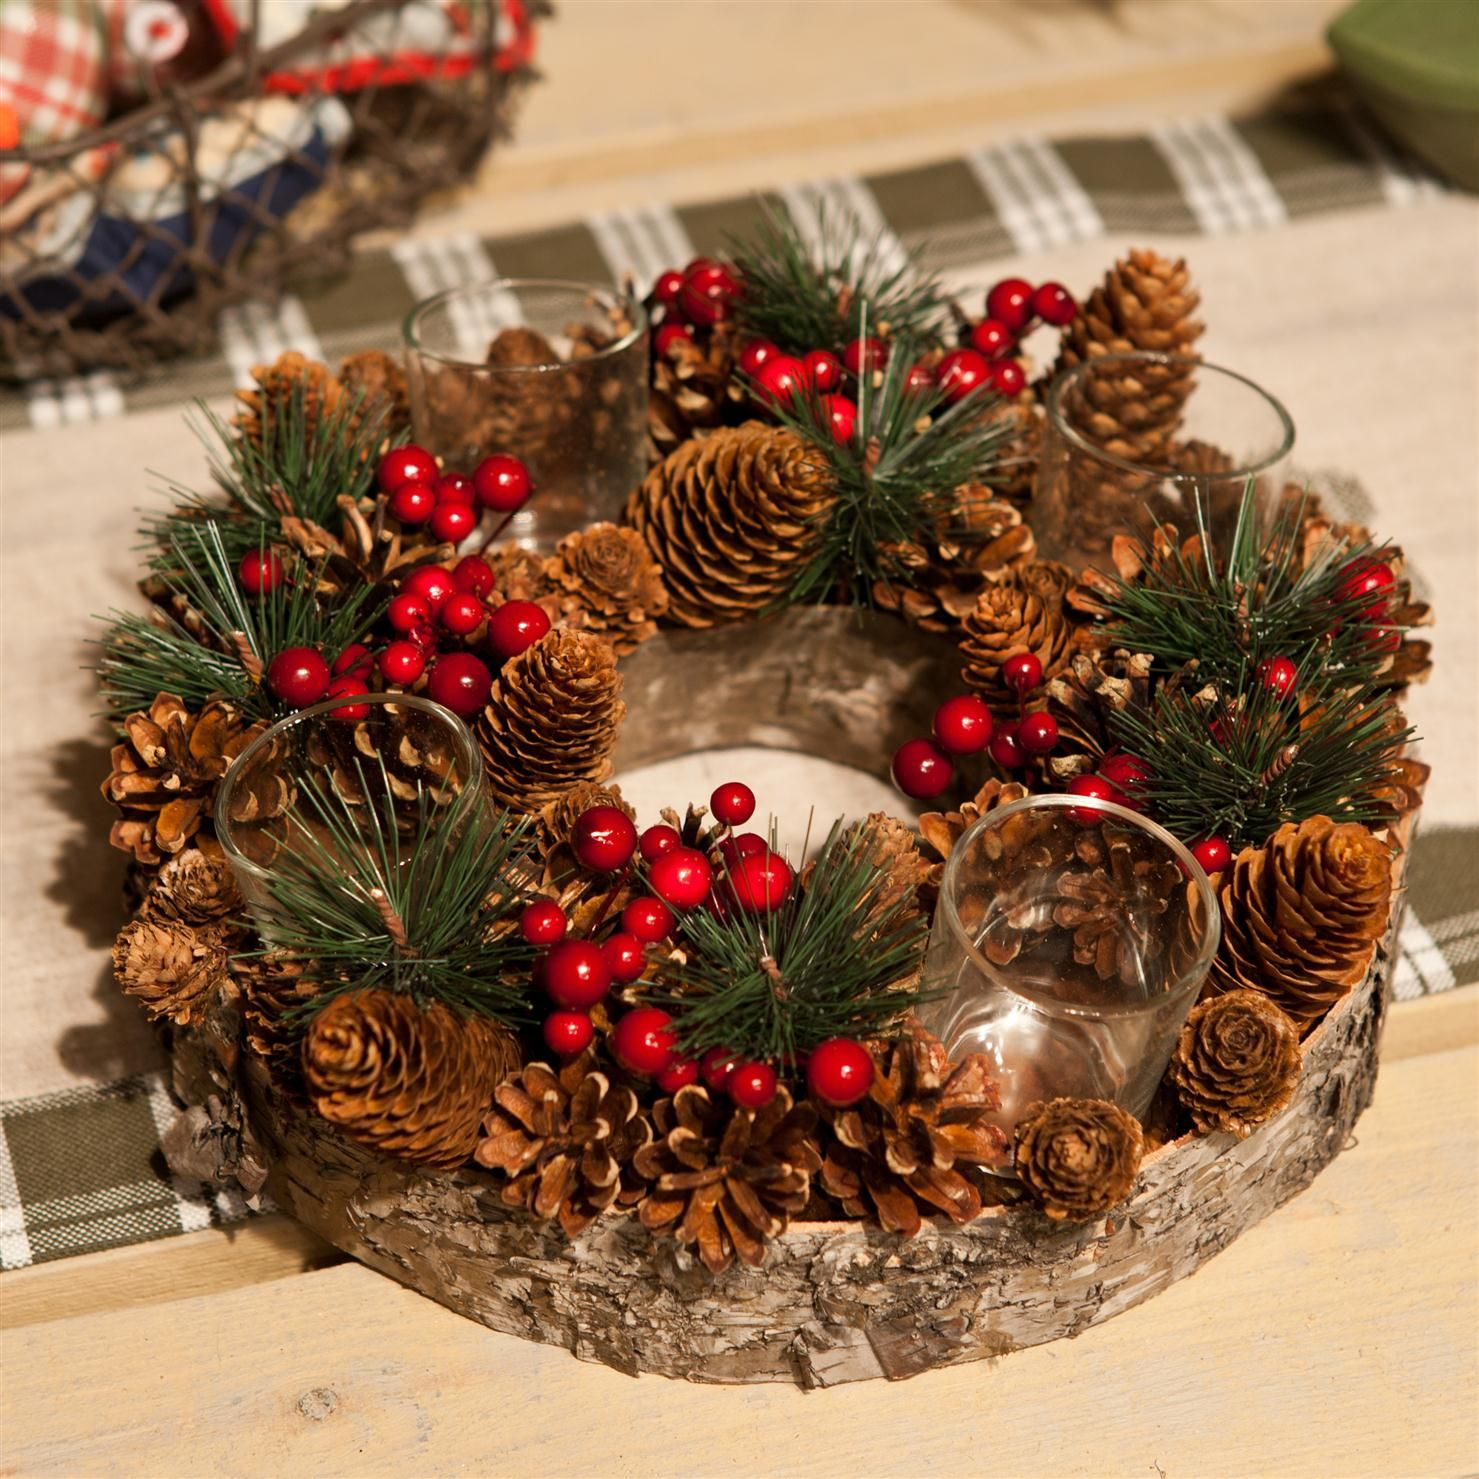 Soporte para velas de gisela graham motivos navide os achica navidad xmas pinterest - Soporte para velas ...